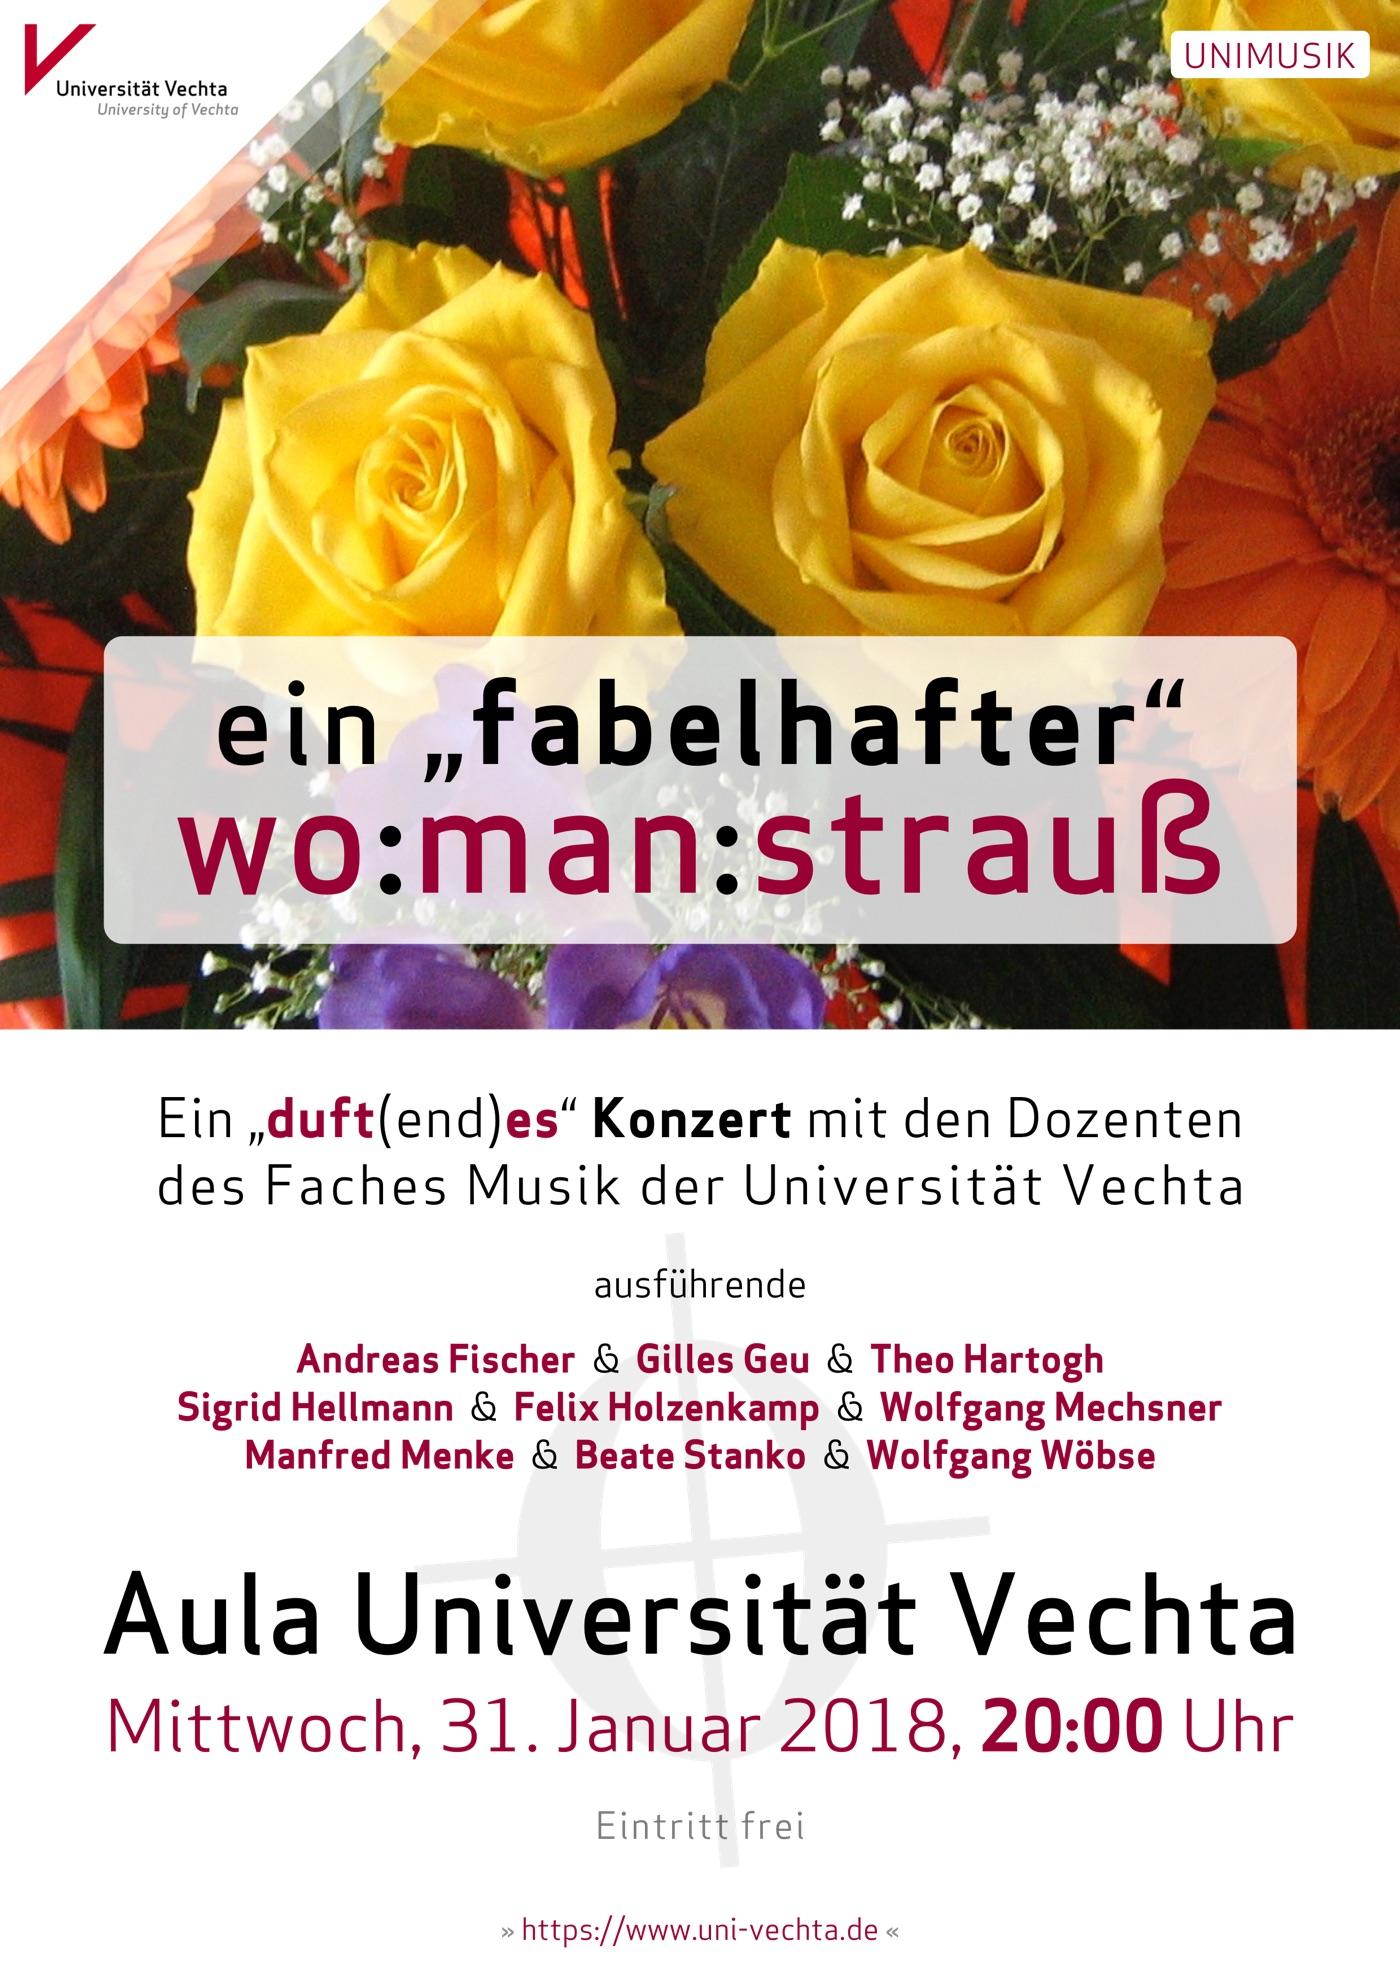 Plakat · UNIMUSIK-Vechta · 31. Januar 2018